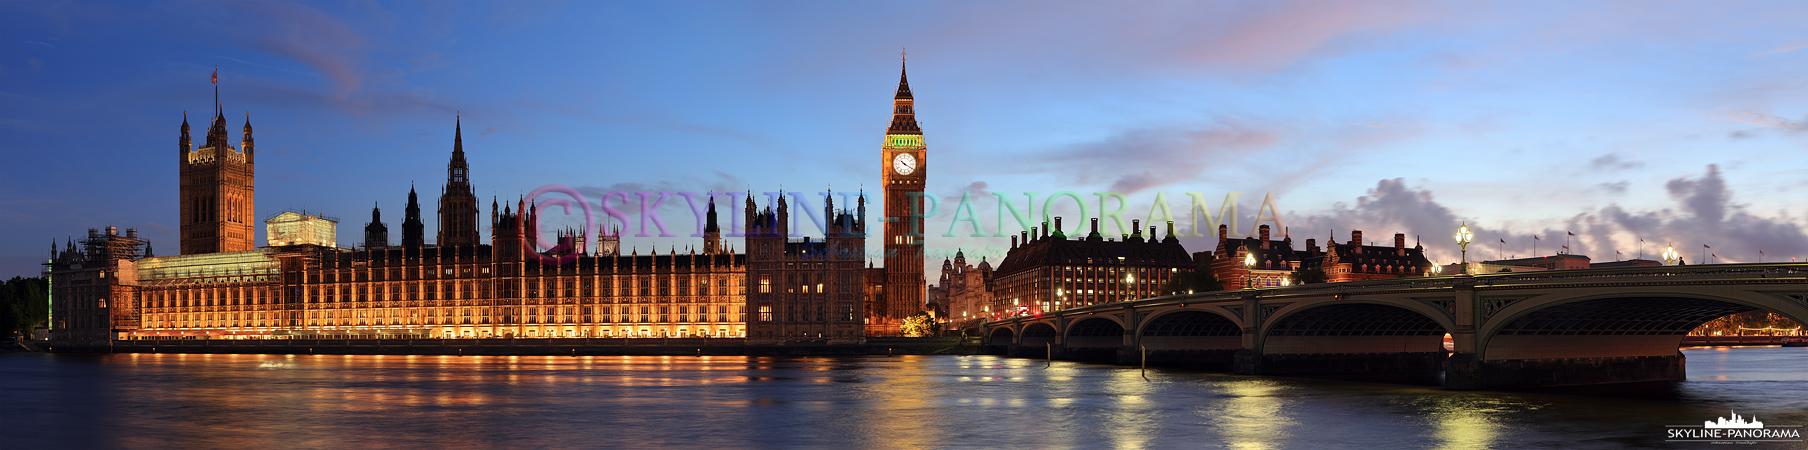 Palace of Westminster - London Panorama